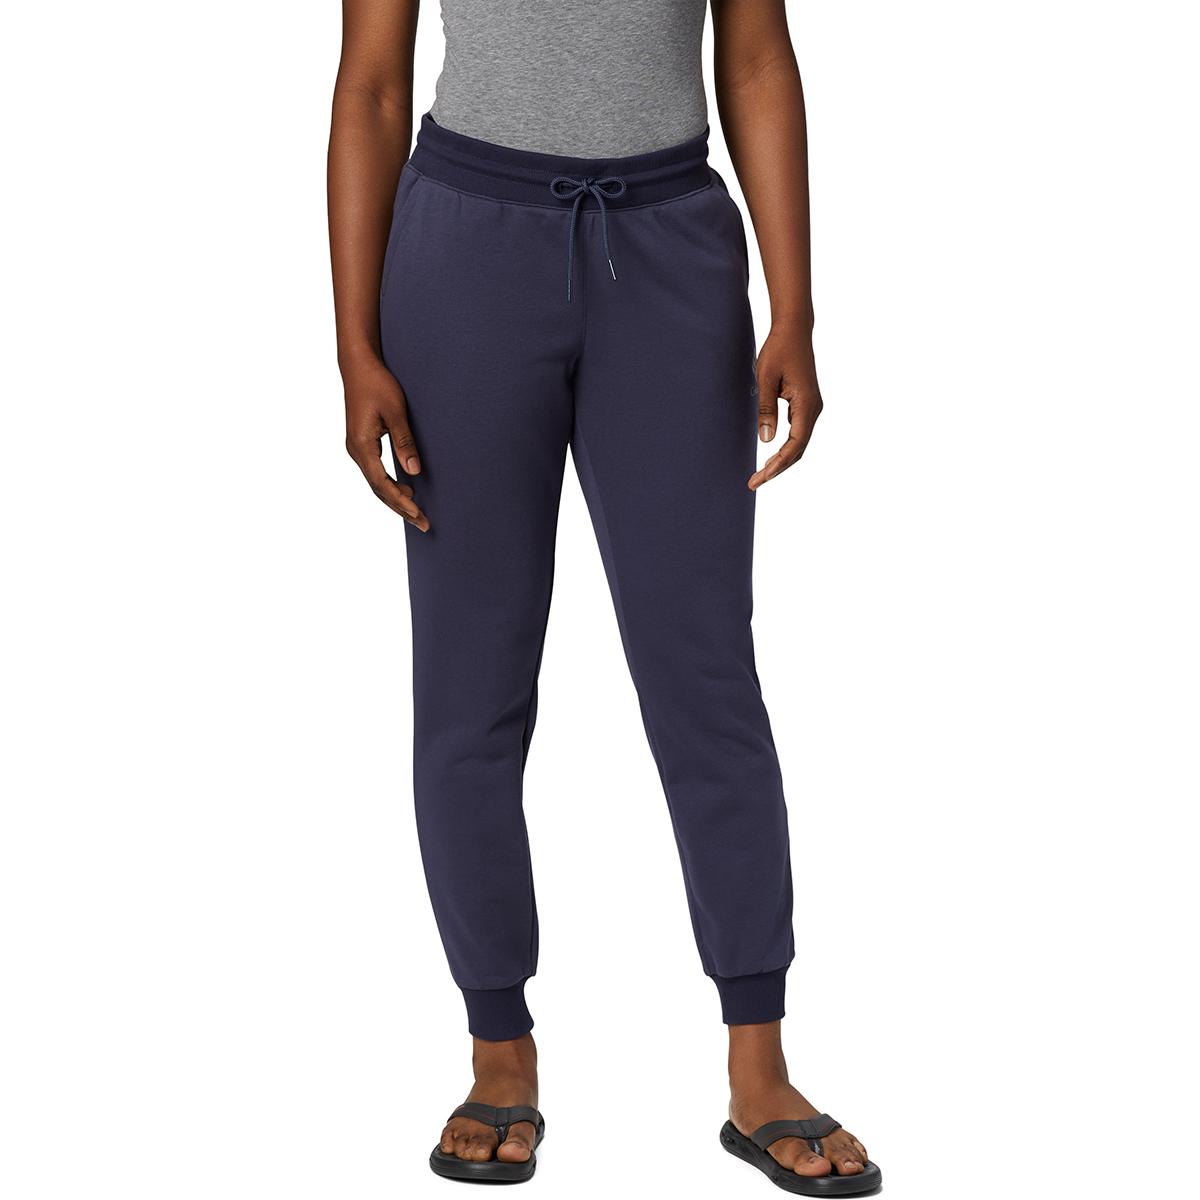 Columbia Women's Logo Jogger Pants - Blue, S